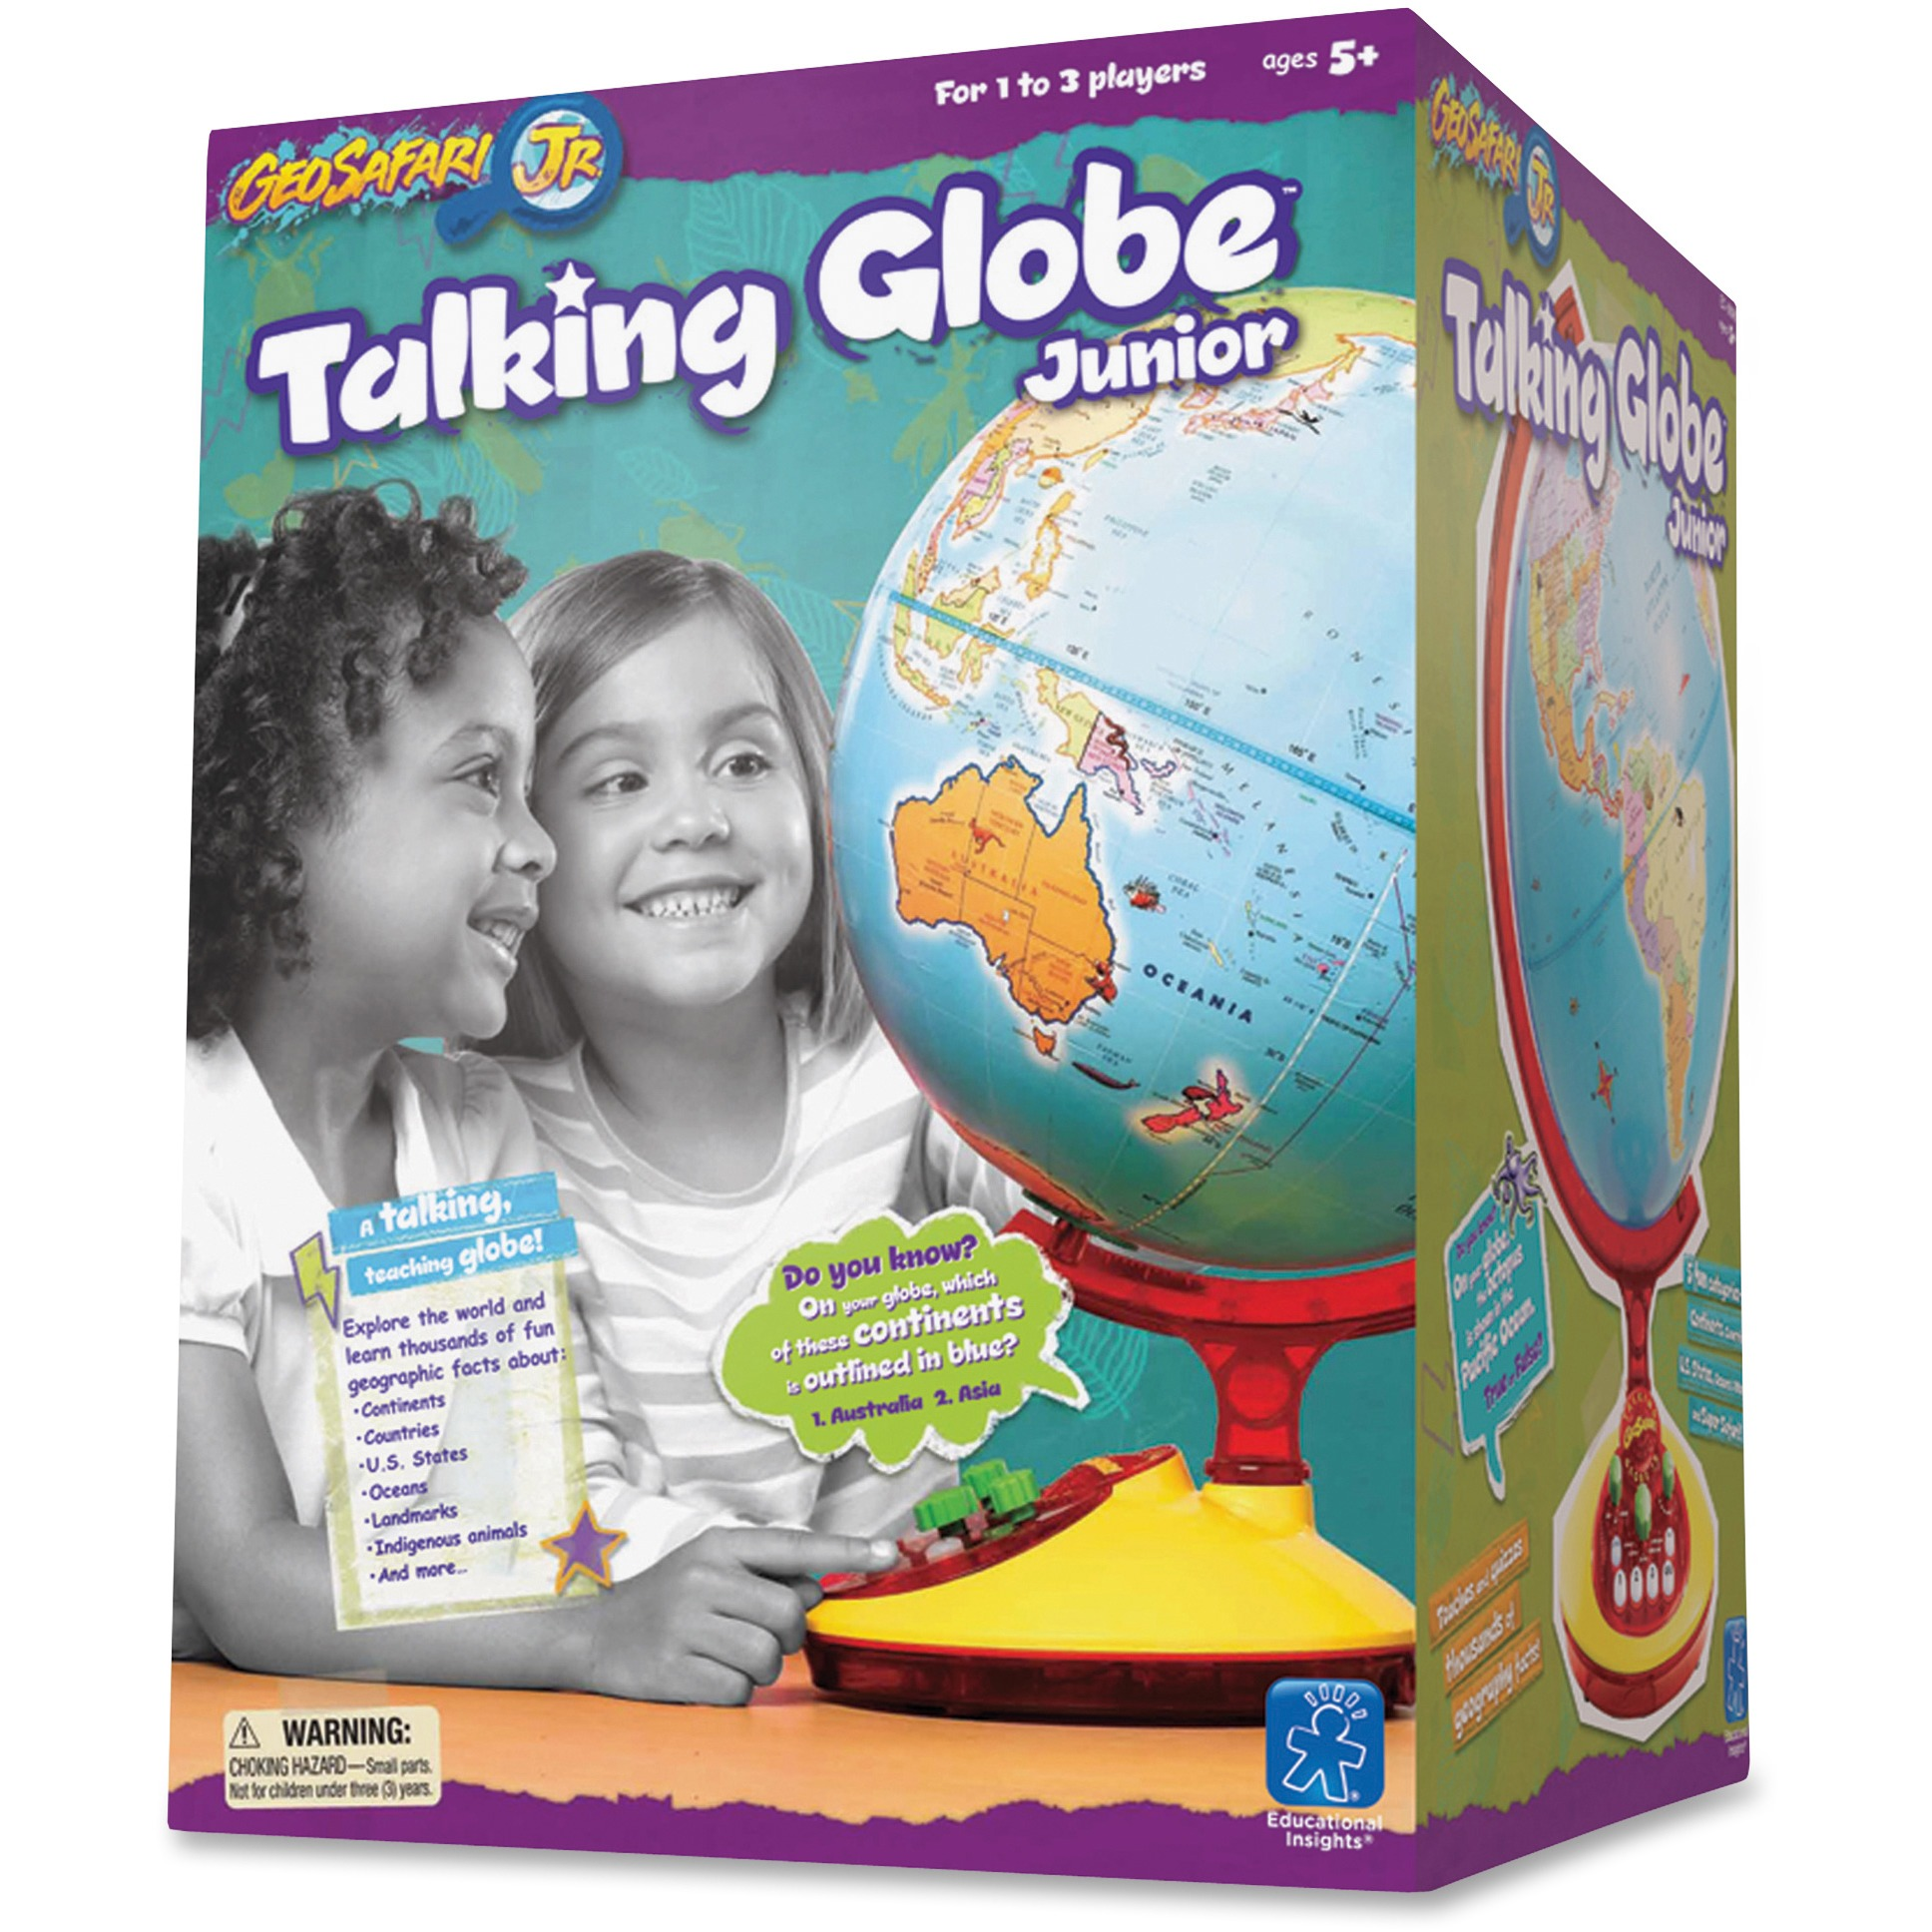 GeoSafari Talking Globe Junior